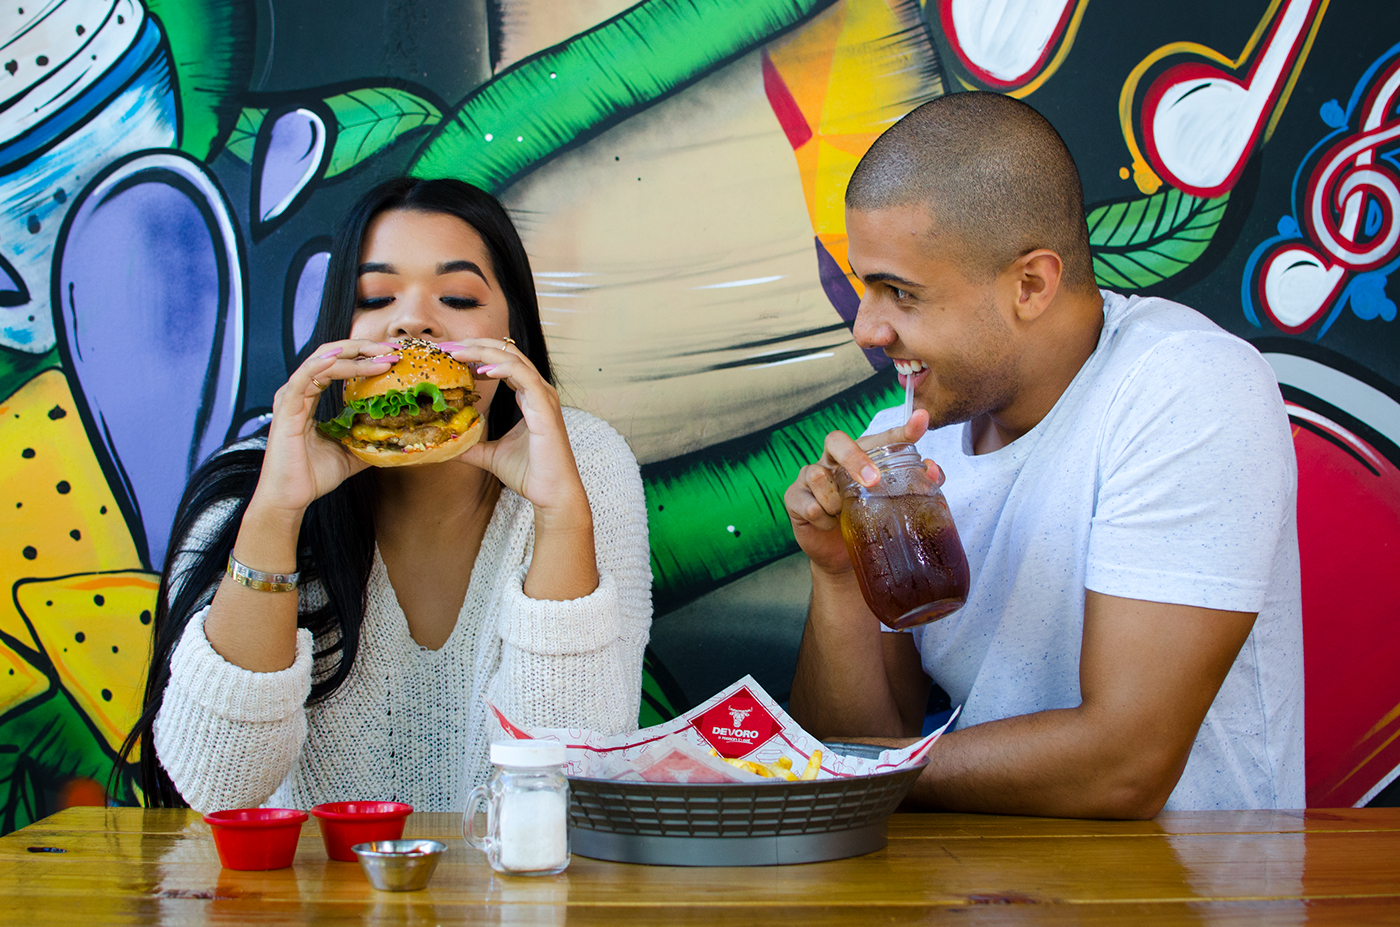 fastfood burguer panama Photography  Nikon 35mm photo foodies foodlover